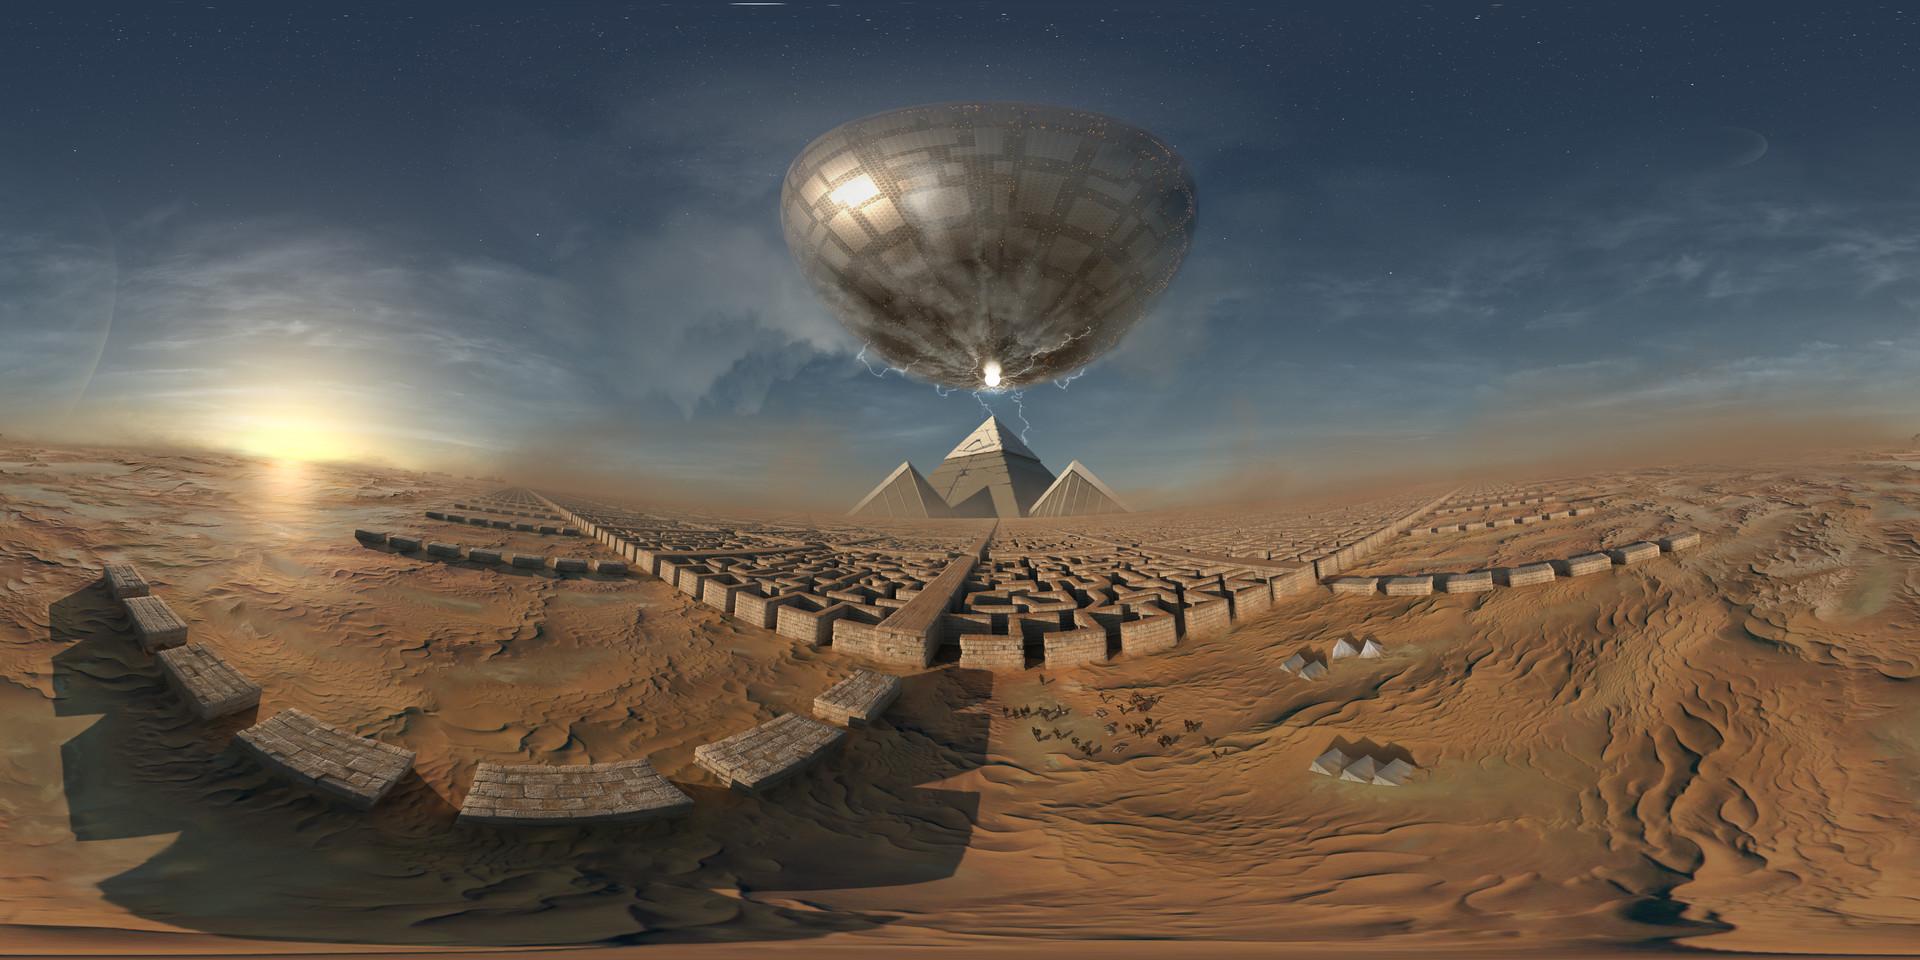 Jeff bartzis as01 env planetsurface spherical 002